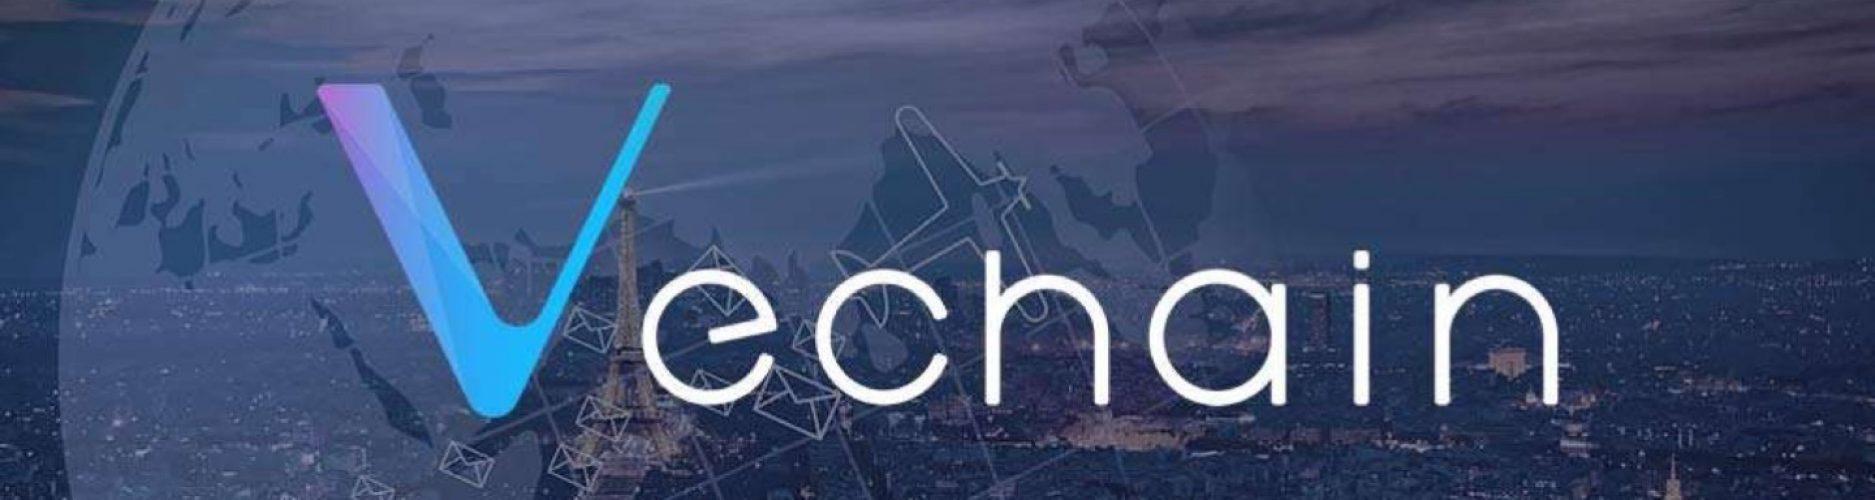 vechain-trading-825673